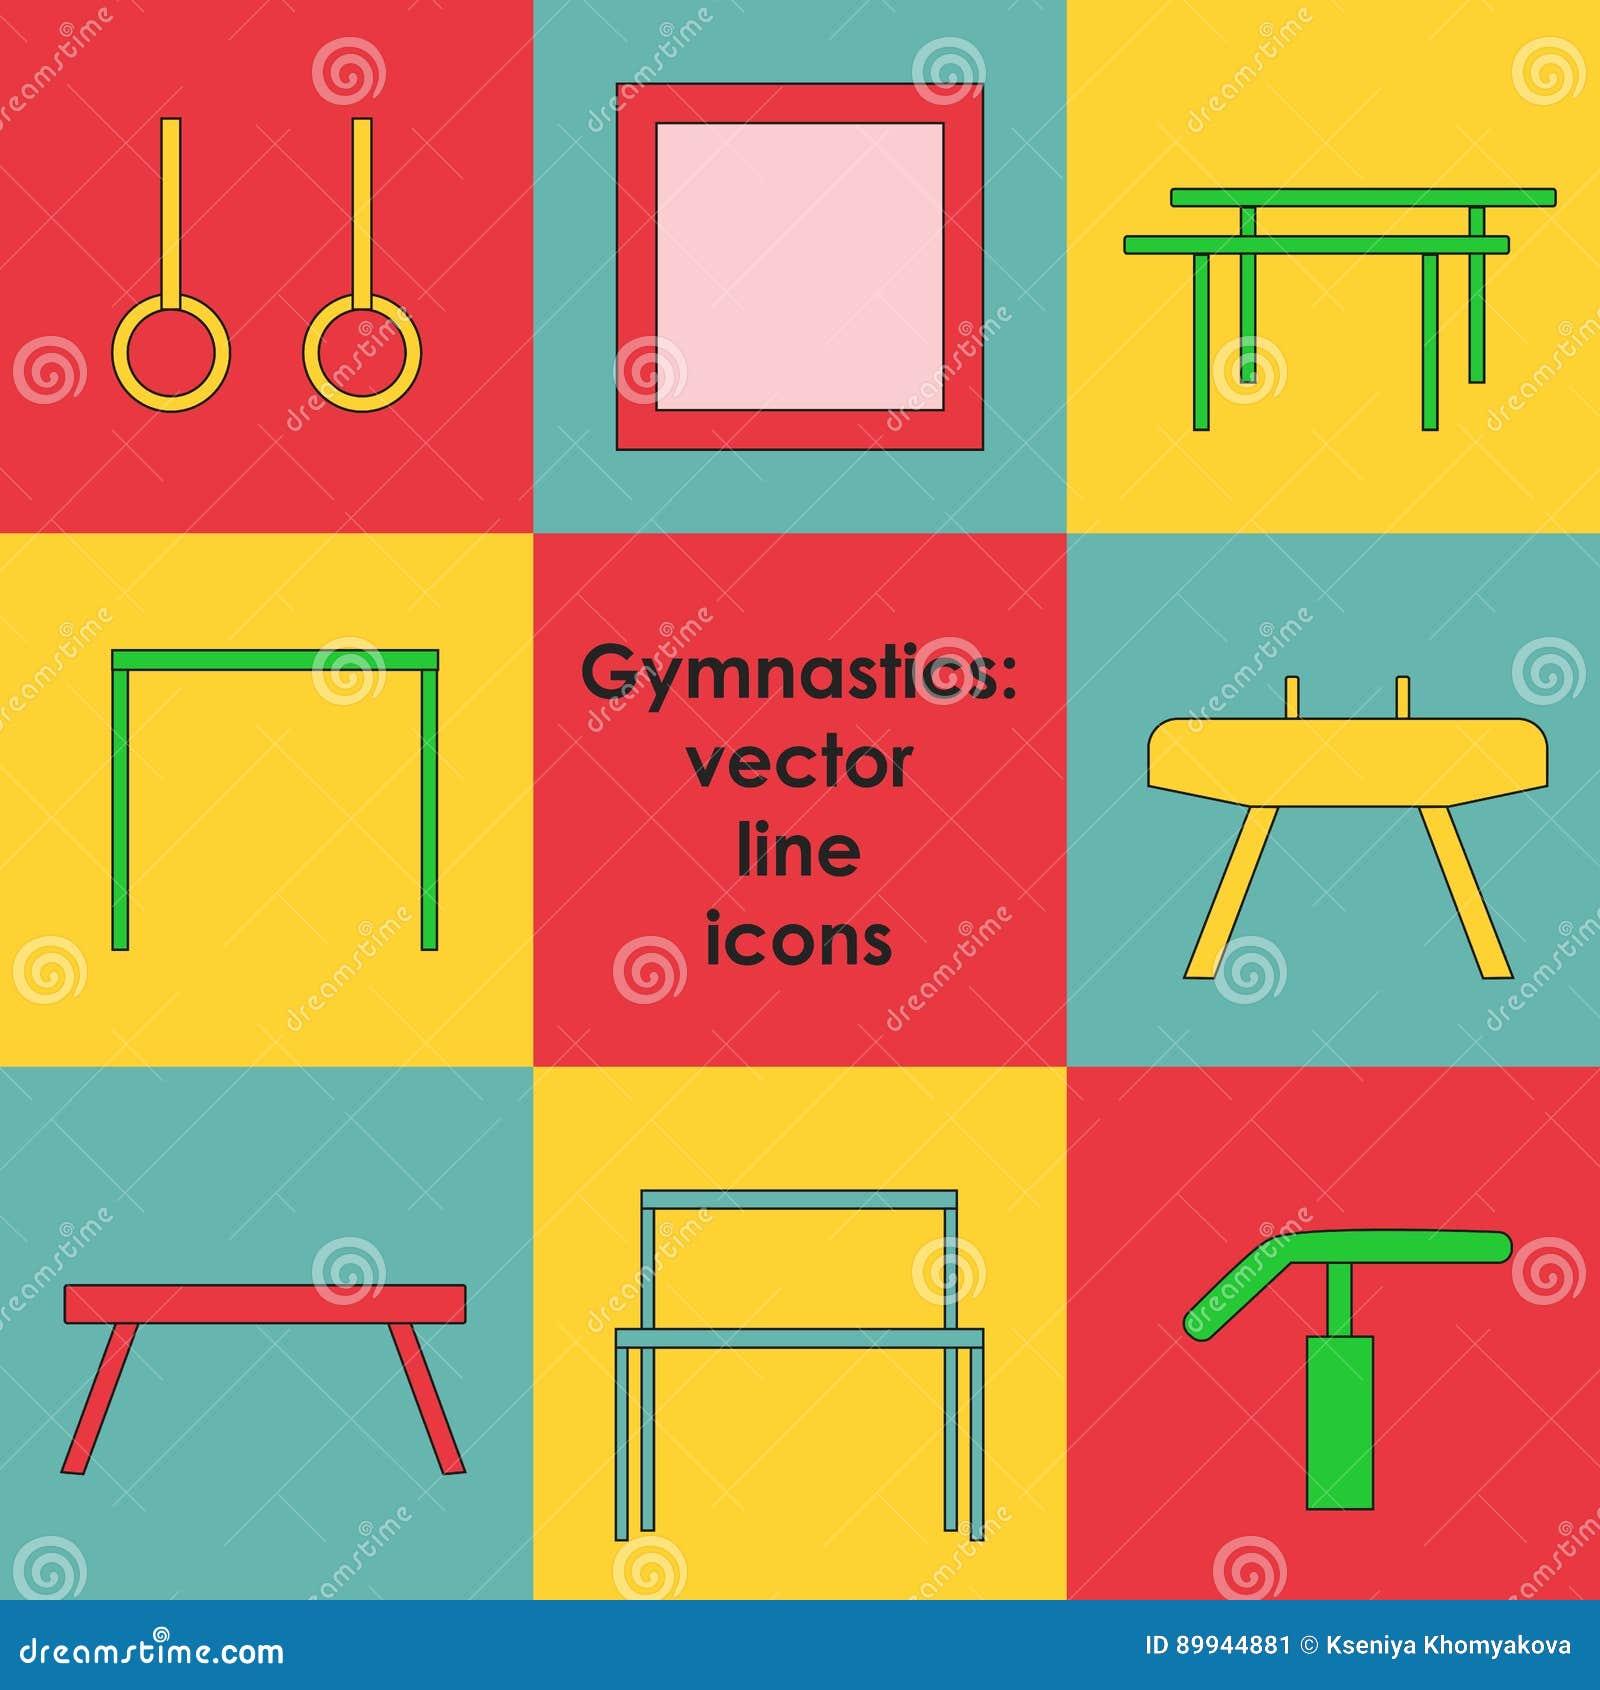 Artistic Gymnastics Equipment Stock Vector Illustration